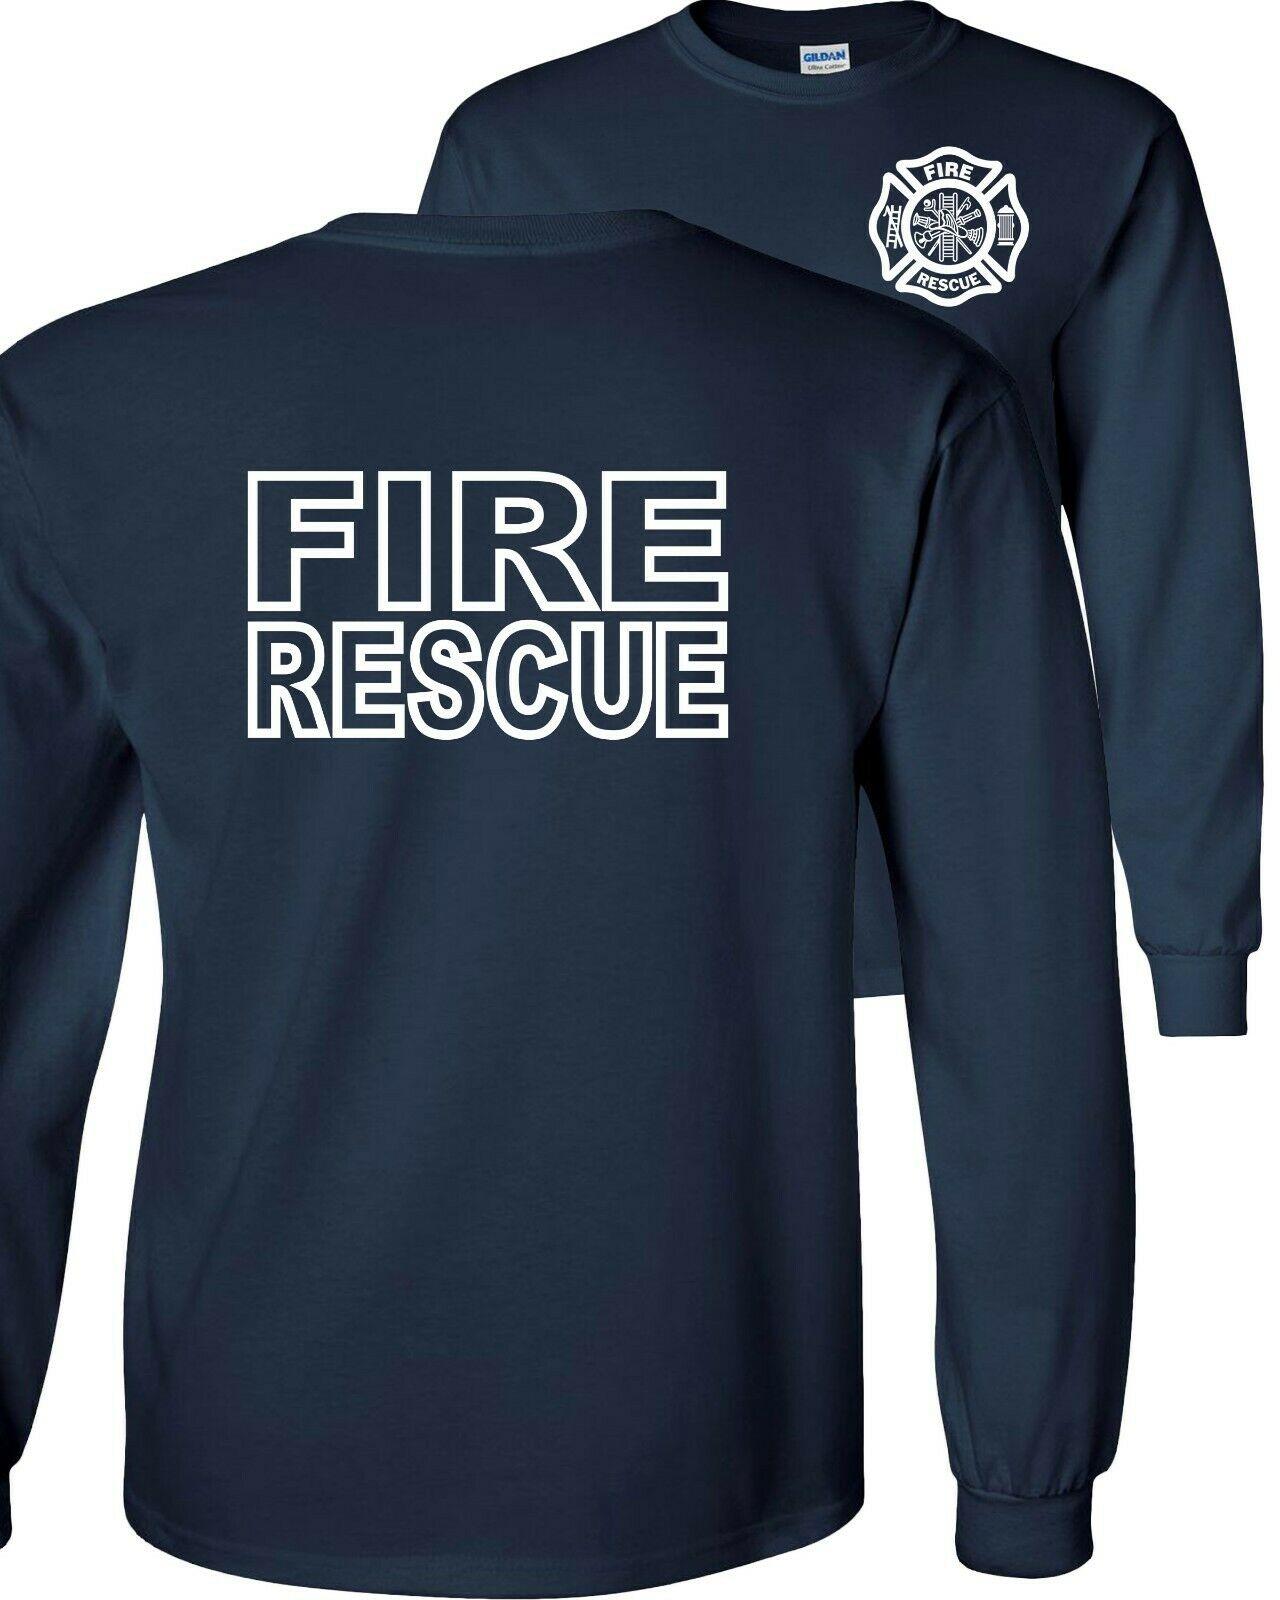 T Shirt Fire Rescue Firefighter Long Sleeve Men T-Shirt  Hip Hop  Cotton  Funny T Shirts